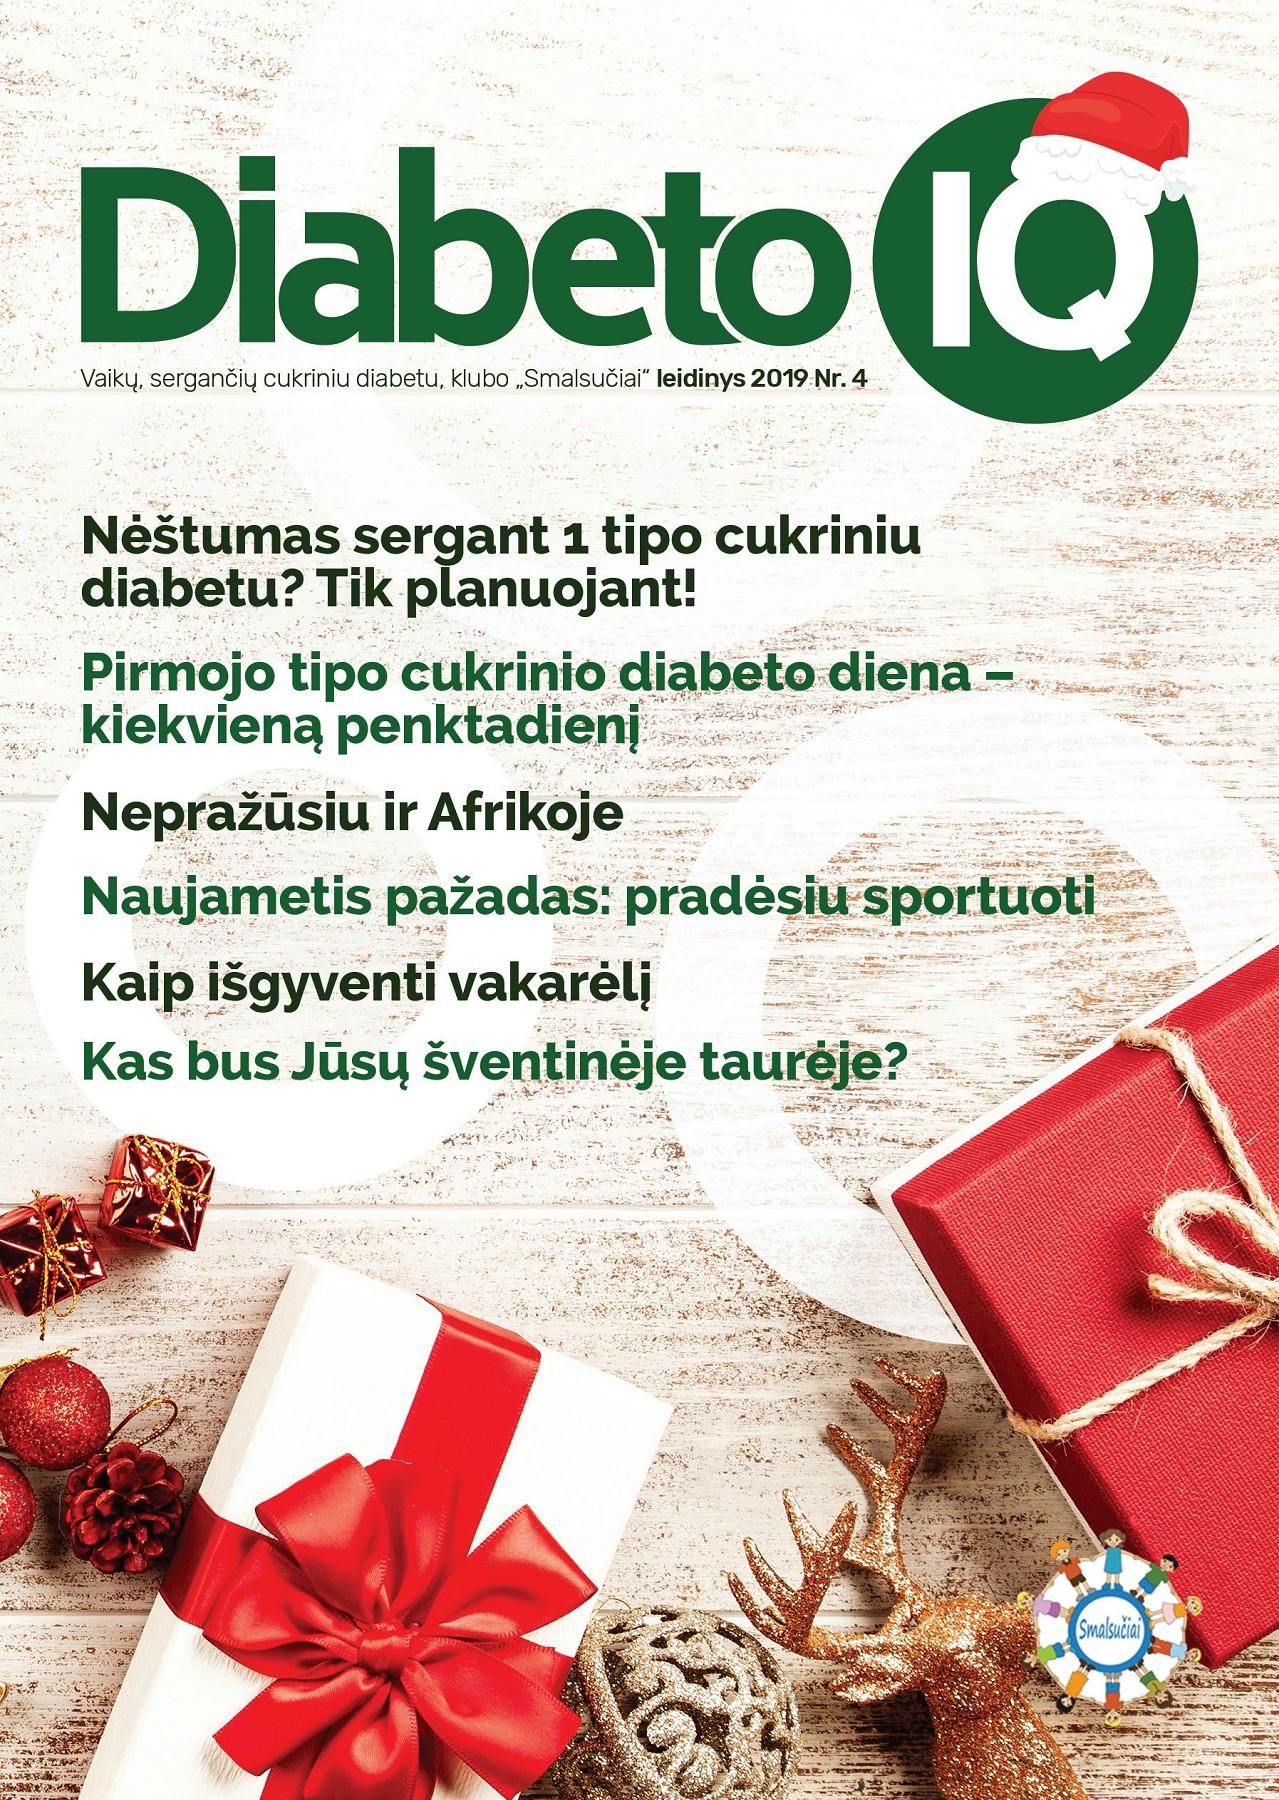 hipertenzija sergant 1 tipo cukriniu diabetu)